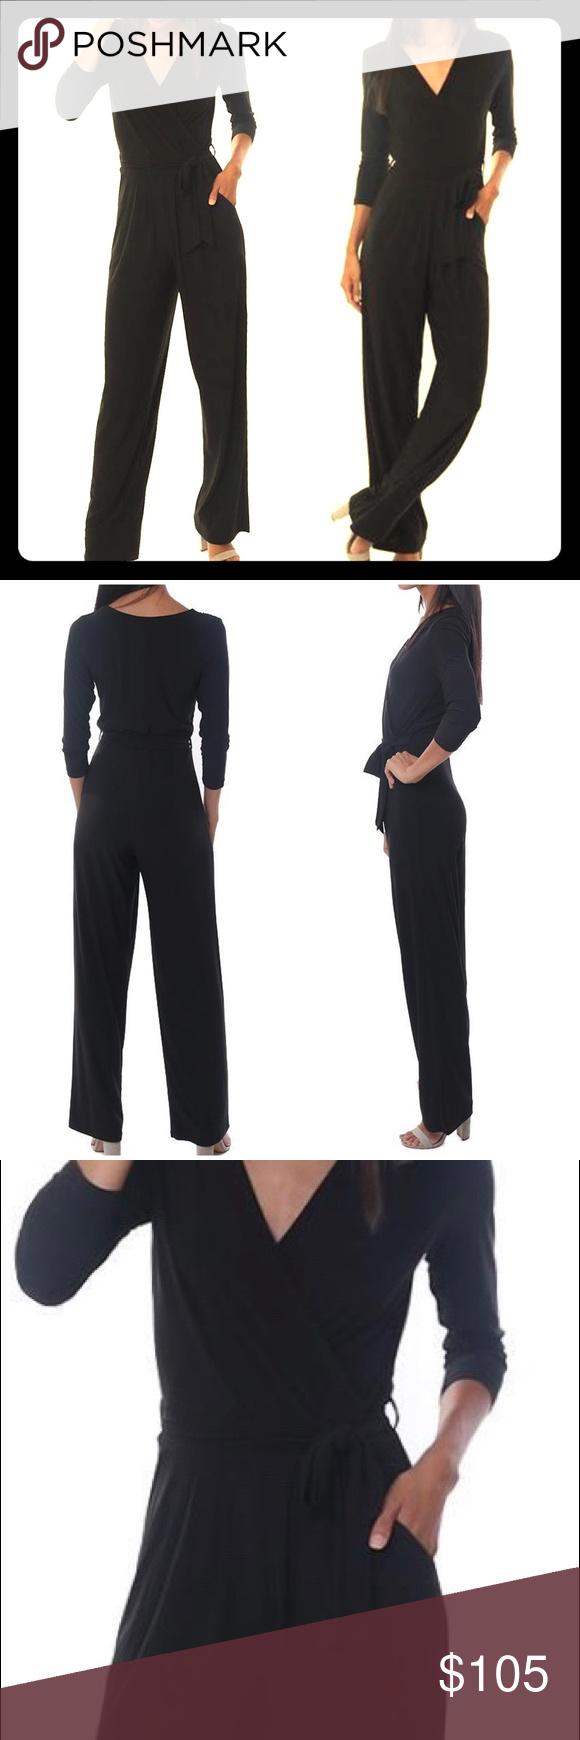 edfbace14719 NWT Last Tango 3/4 sleeve blk jumpsuit sz XS NWT NEVER WORN SIZE XS ...